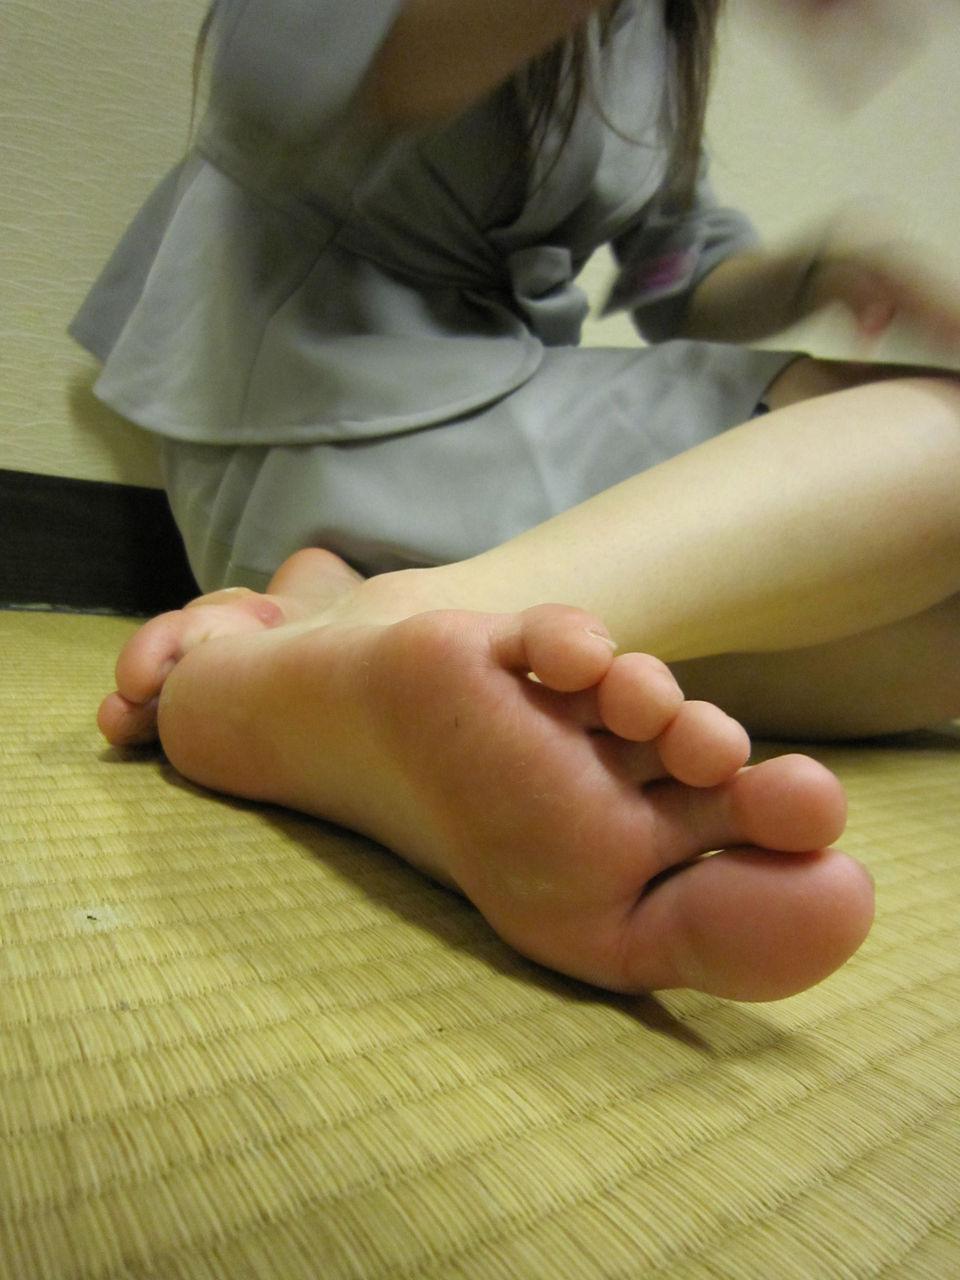 OLお姉さん蒸れ蒸れ素足生足黒パンスト足裏エロ写メ画像6枚目